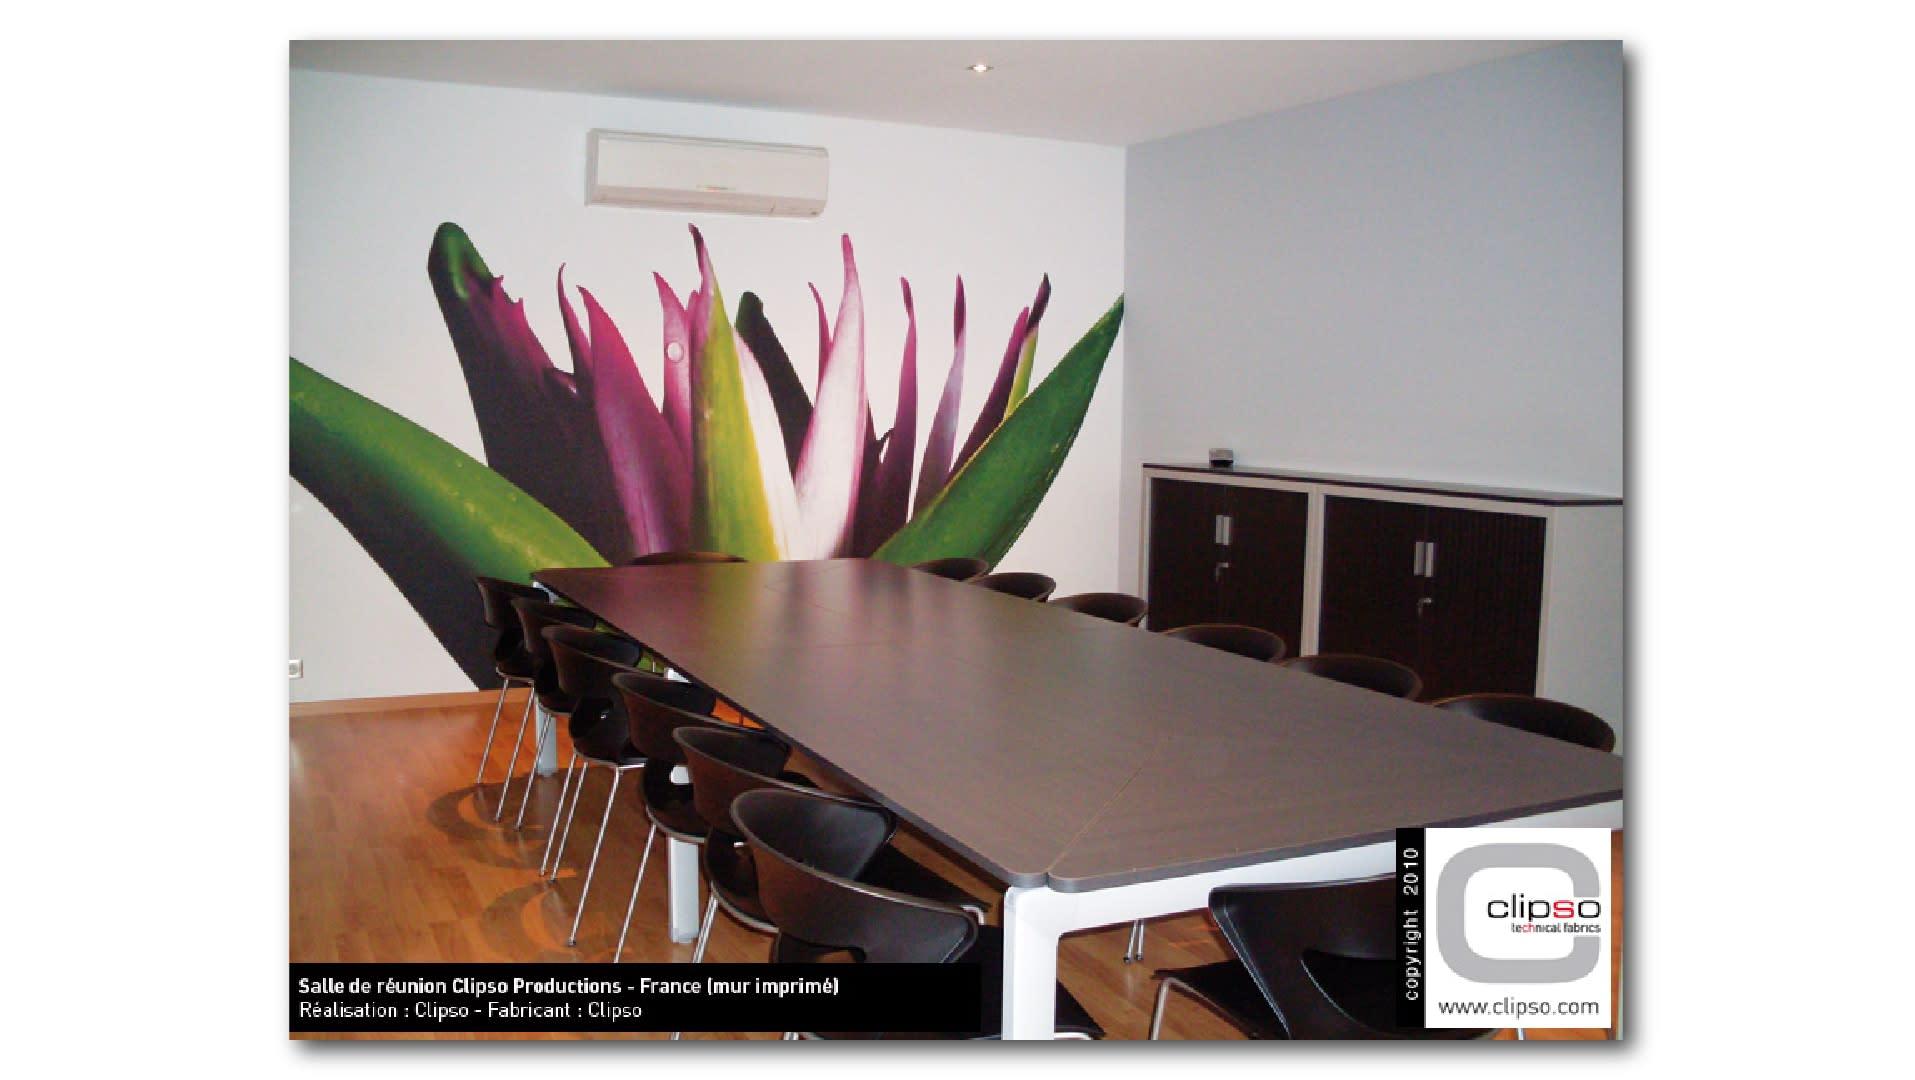 Wand-Clipso-Print-Decke-Clipso-Standard-Besprechungsraum-01_kzv4w5